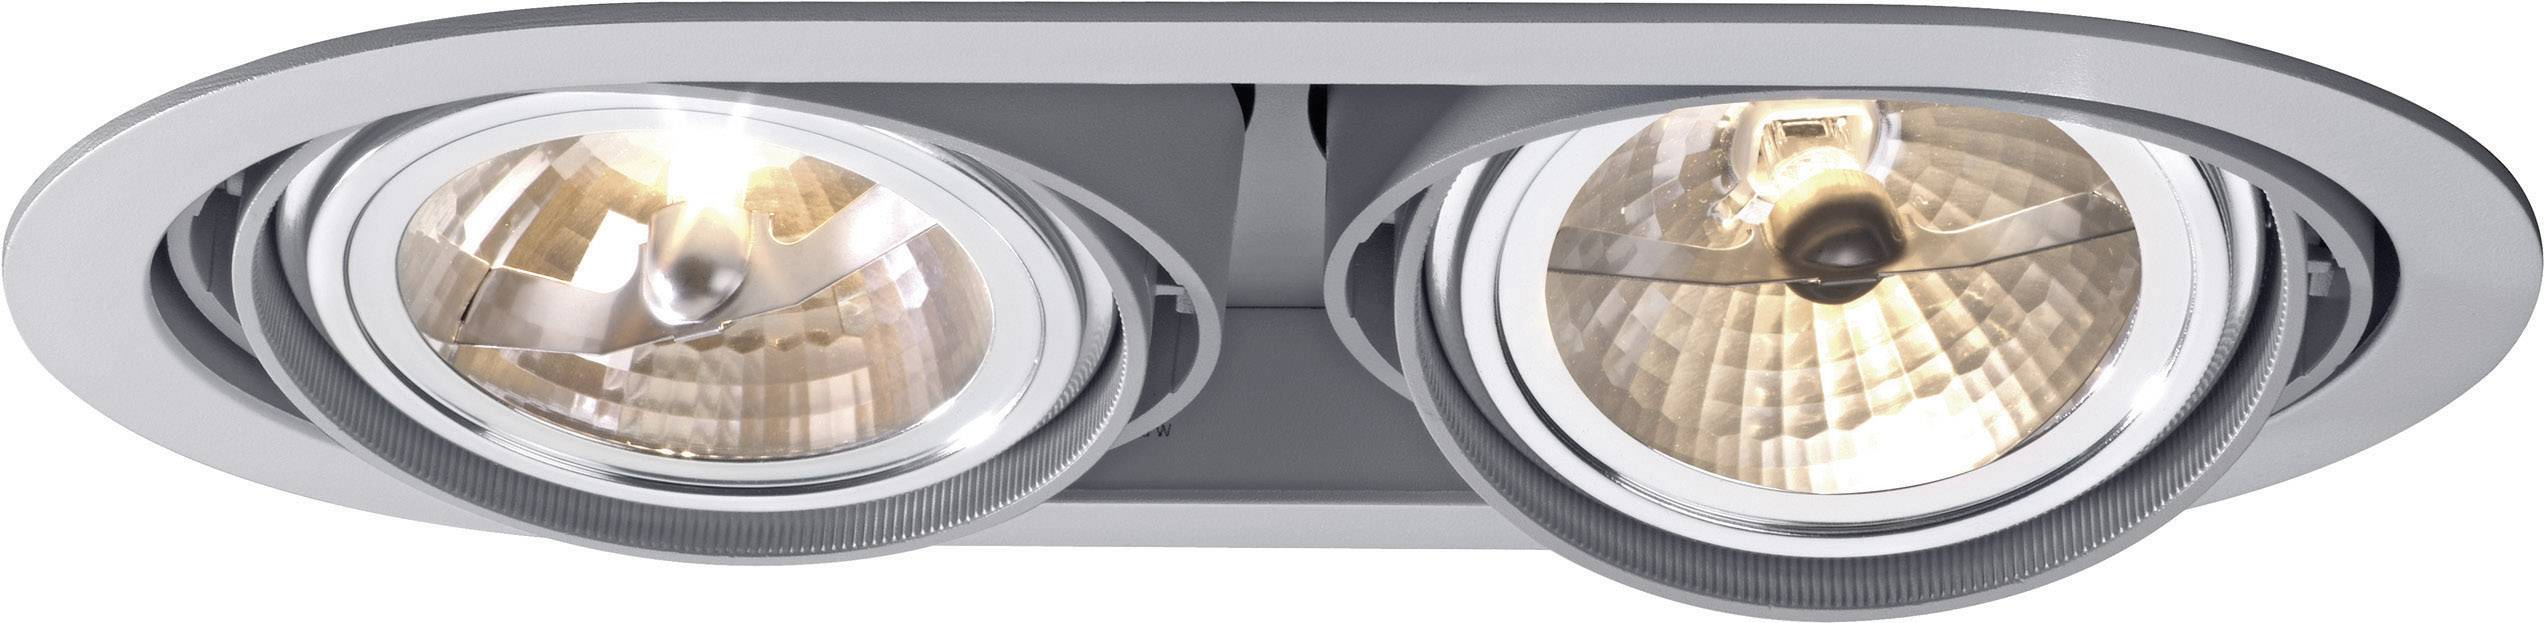 Svietidlo DOWNLIGHT BARI, 2 x 100 W, sivá